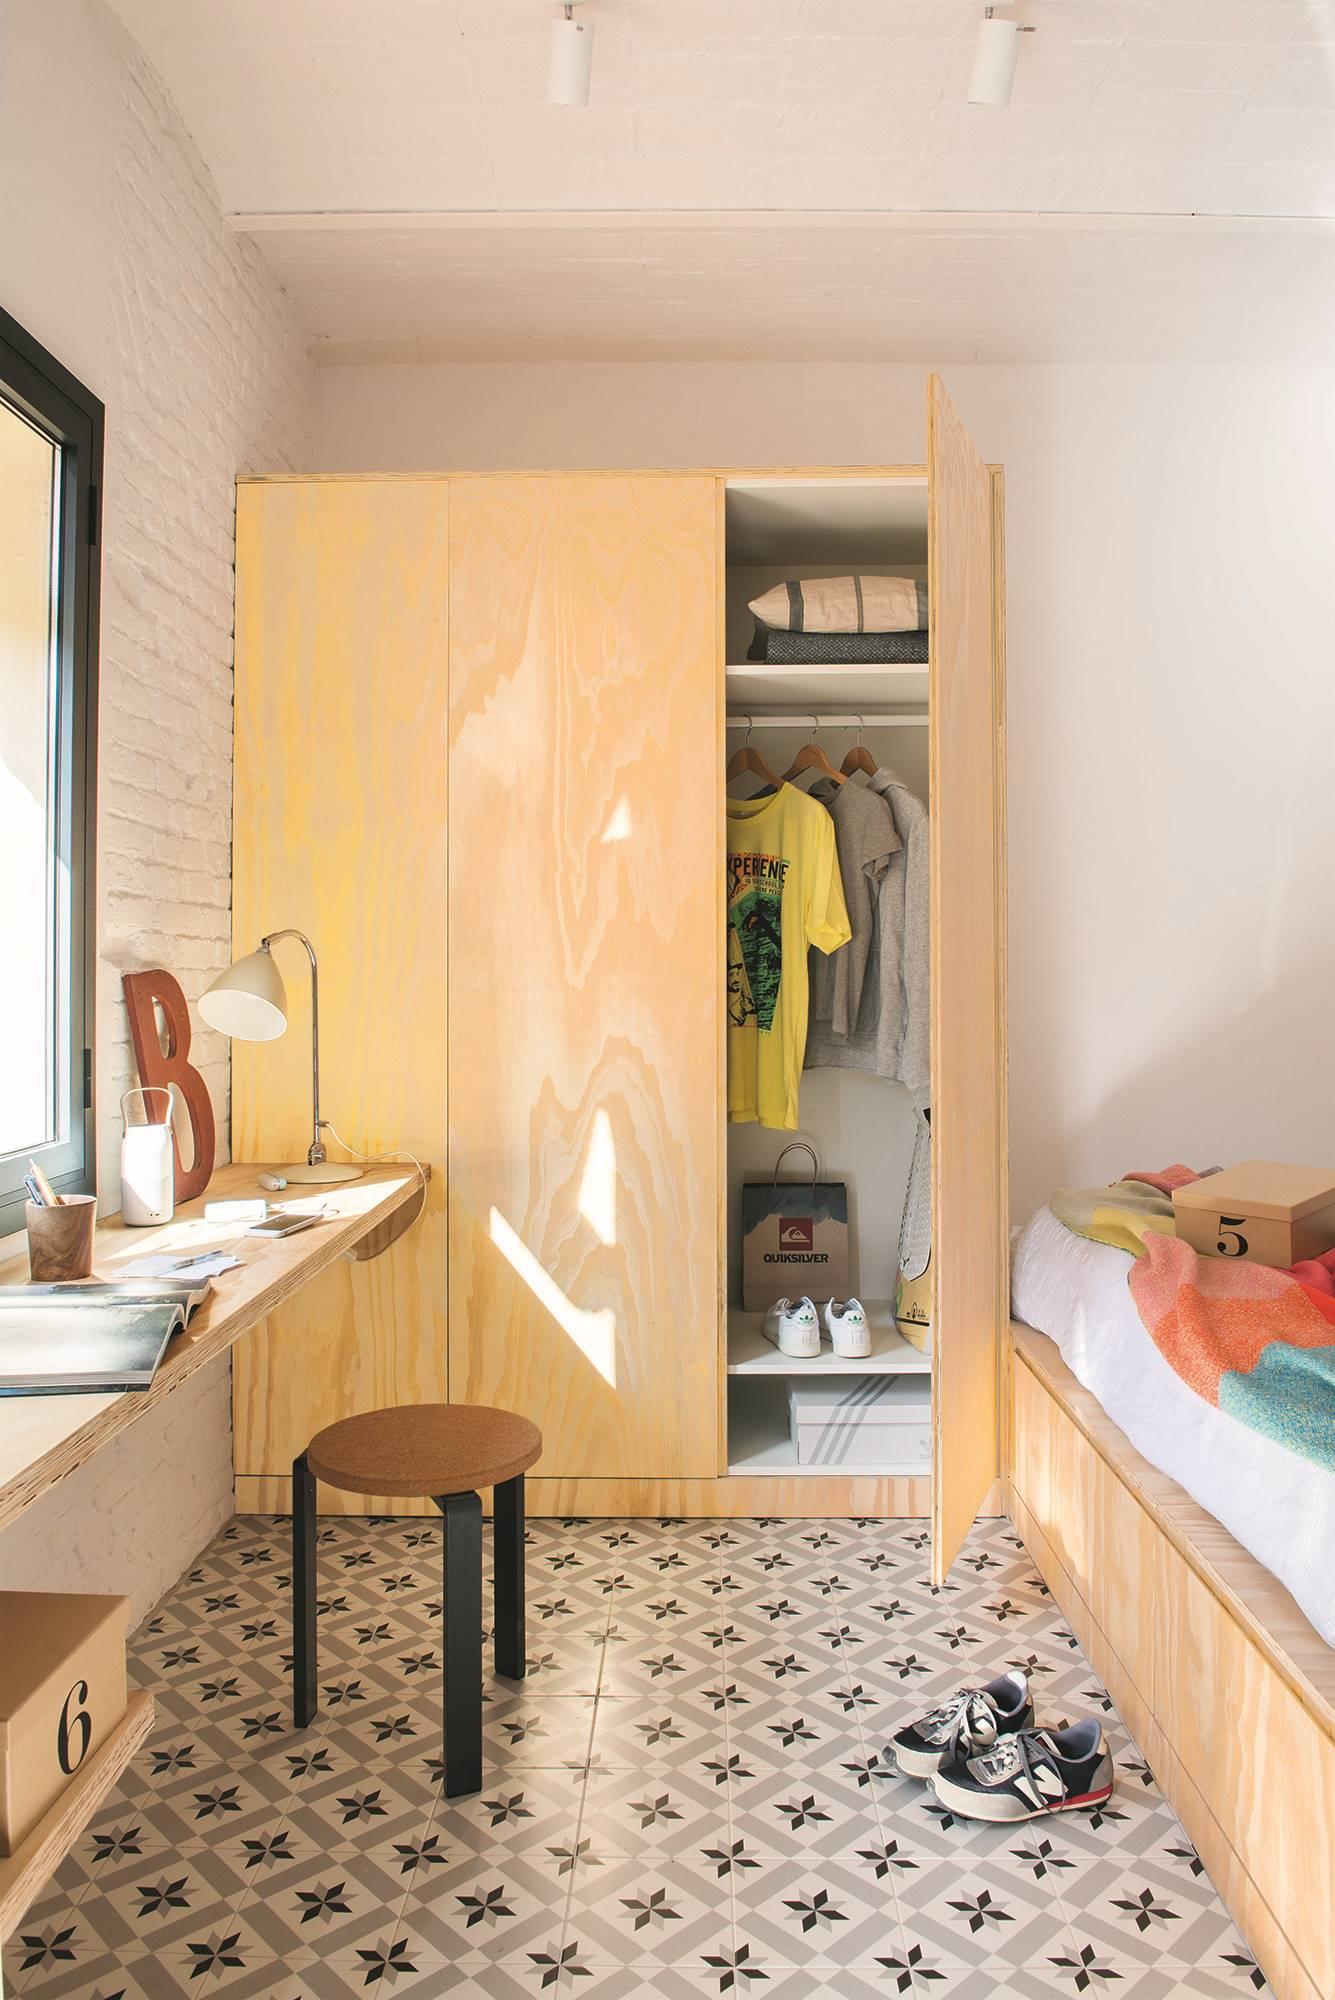 dormitorio Barceloneta almacenaje. Pocos muebles, mucho almacenaje